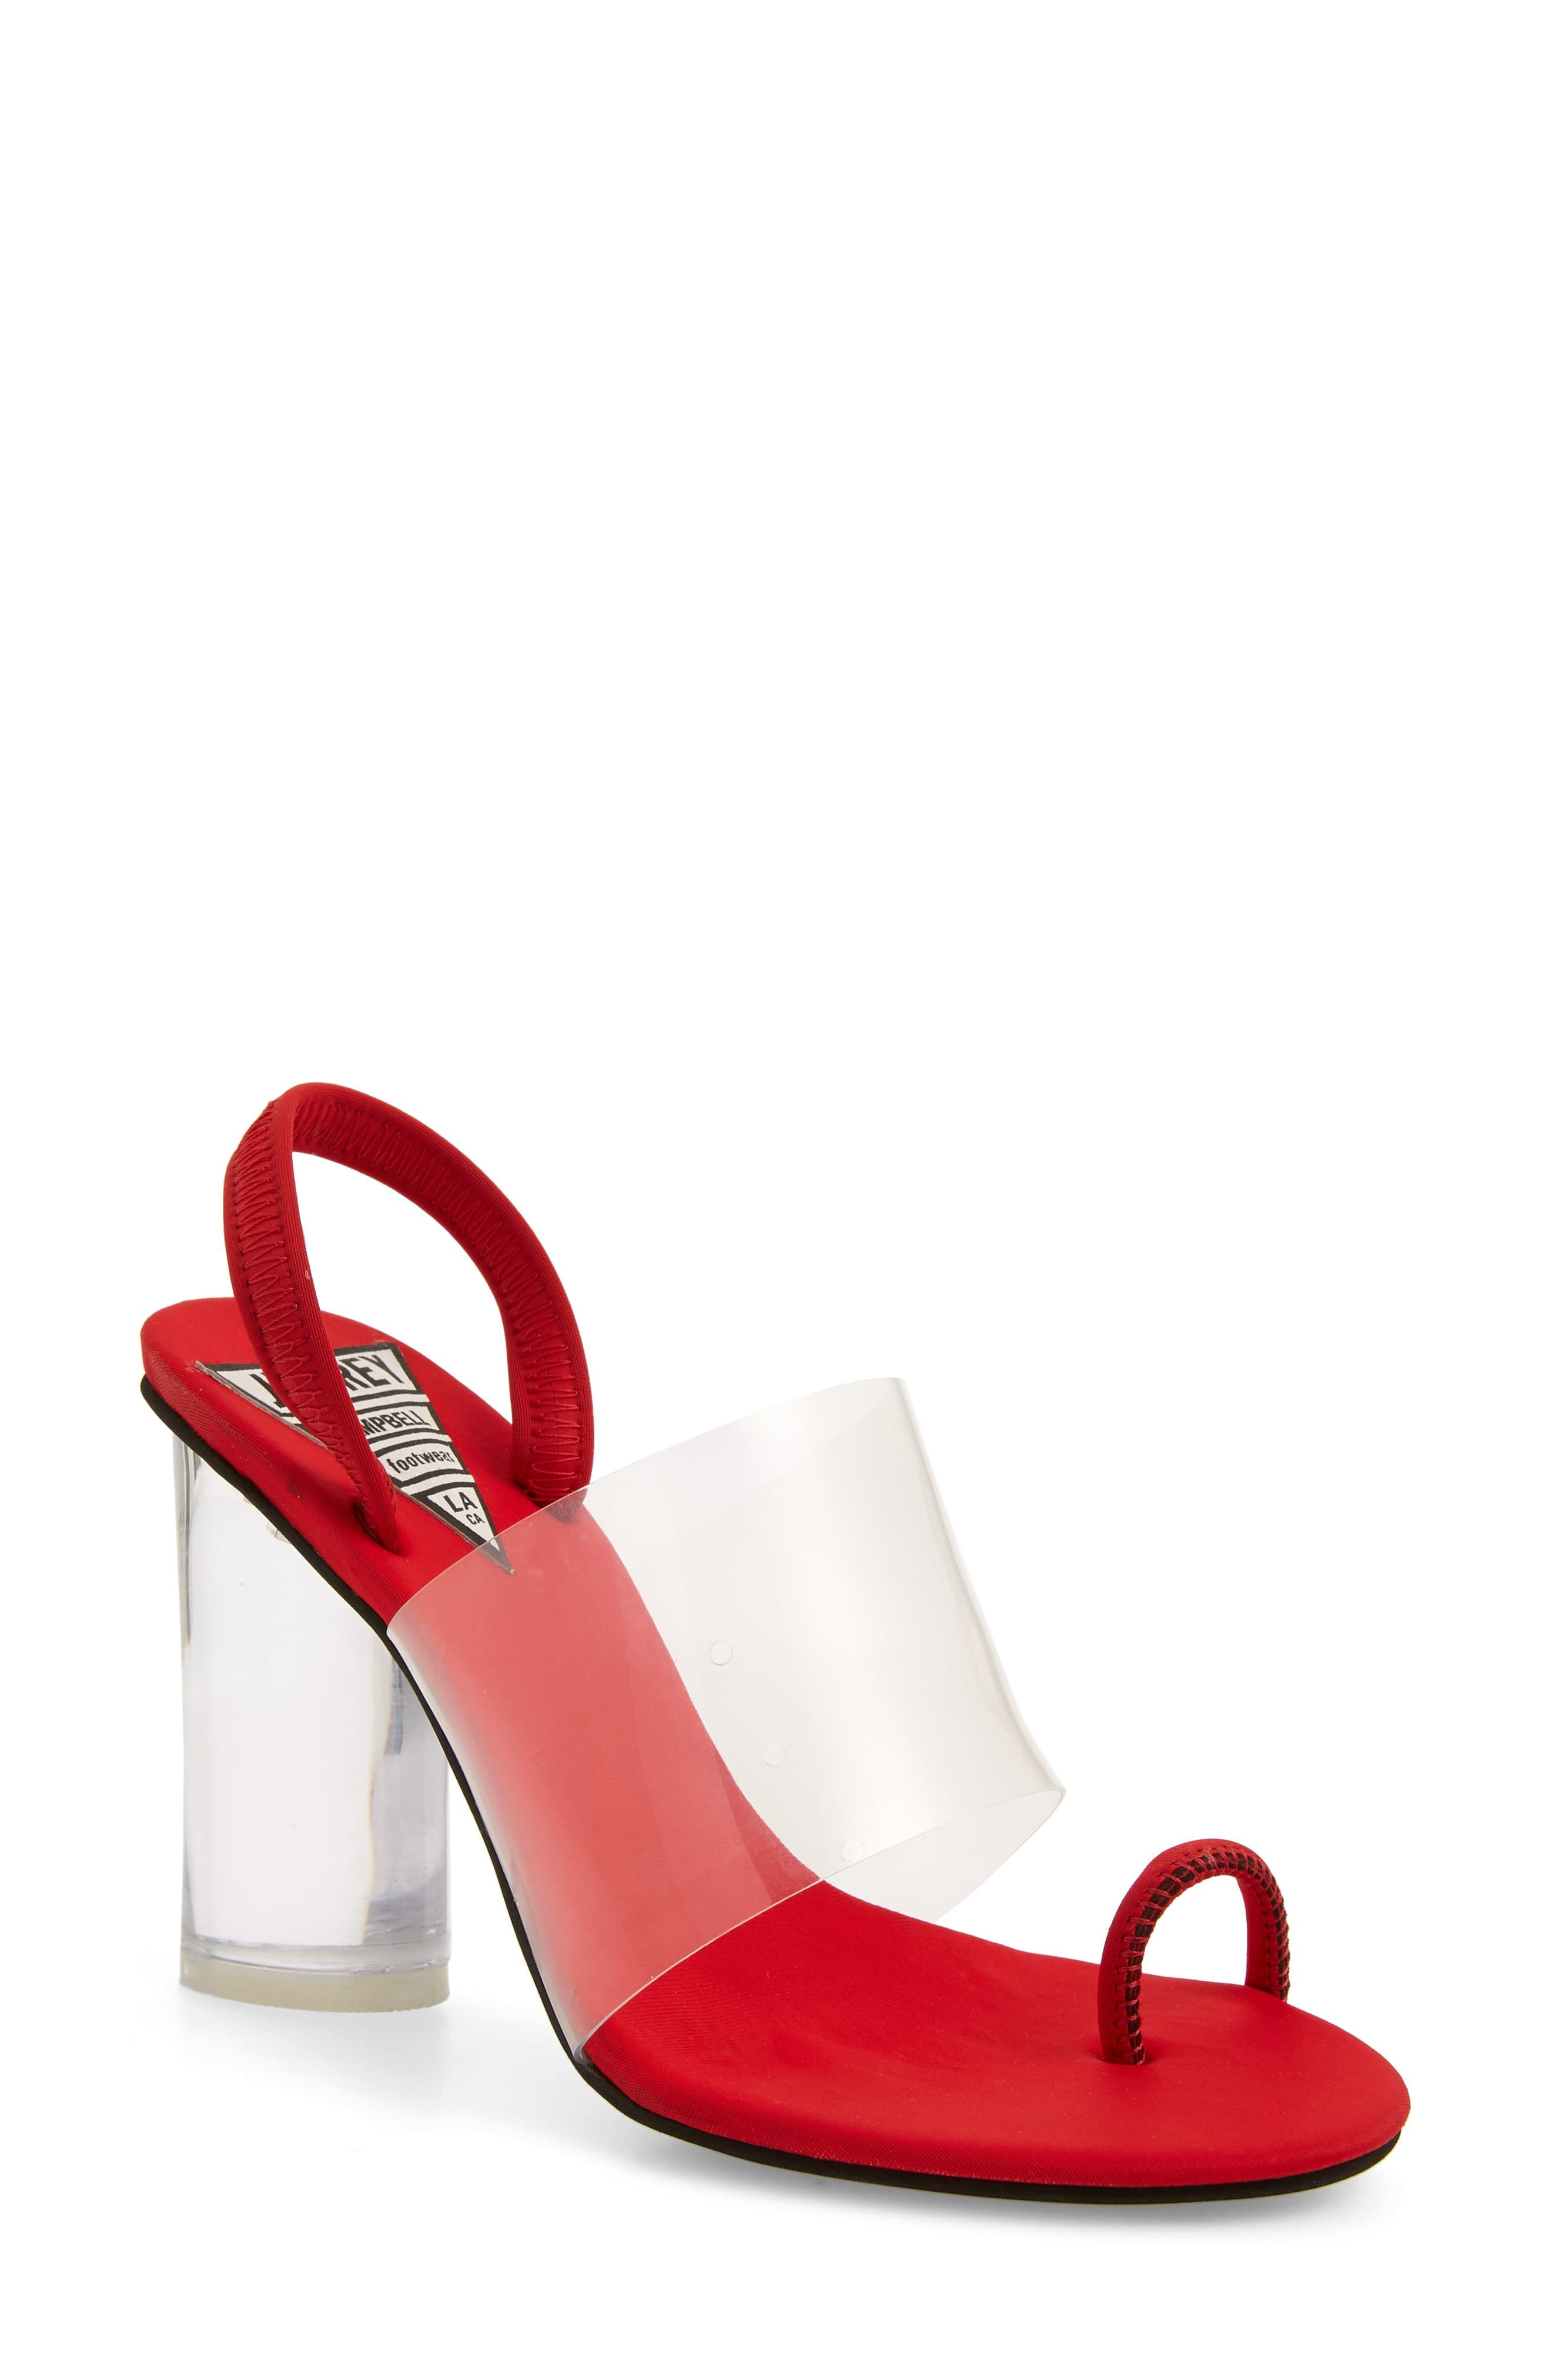 d621b2ddaa2 Women's Jeffrey Campbell Mania Clear Toe Loop Sandal, Size 10 M ...